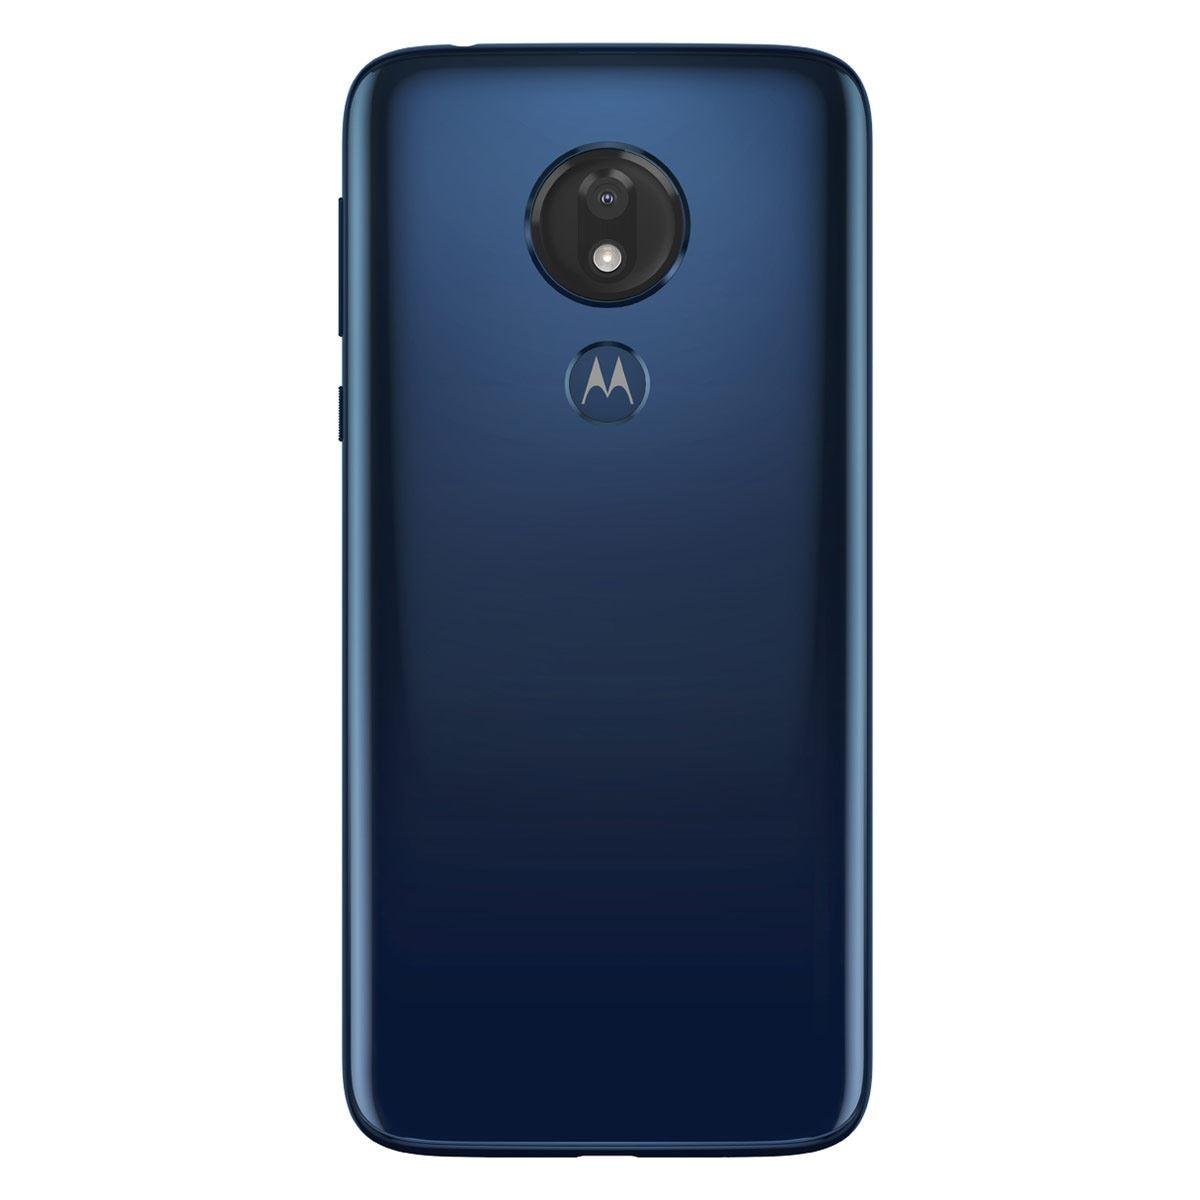 Celular Motorola XT1955-2 G7 Power Color Azul R9 (Telcel)